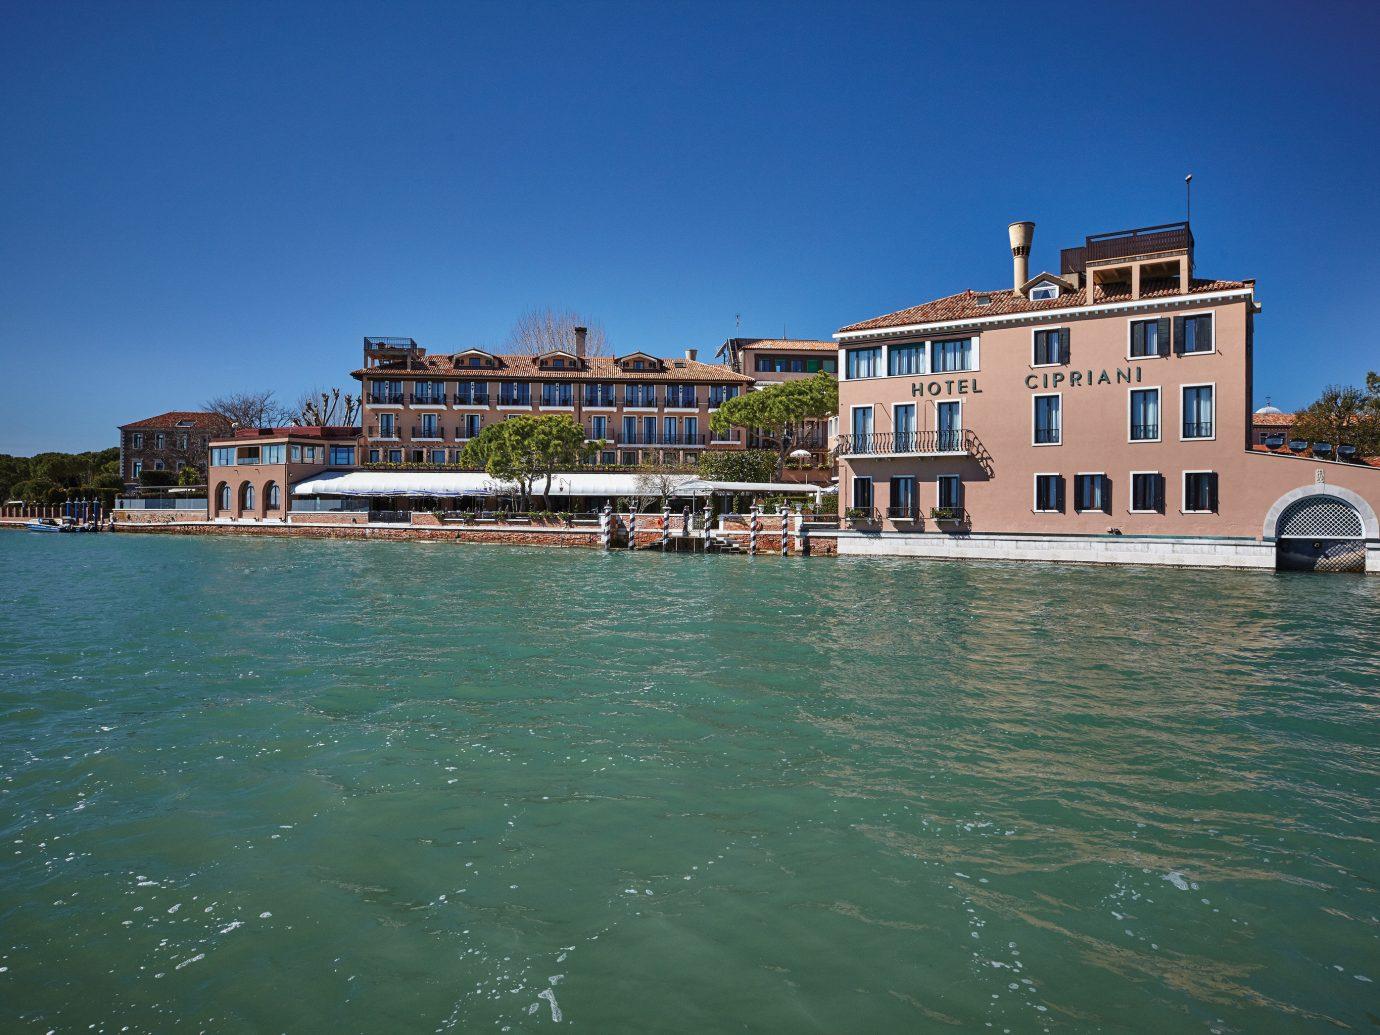 Hotels sky water outdoor Sea body of water vacation Coast Ocean vehicle bay Harbor waterway